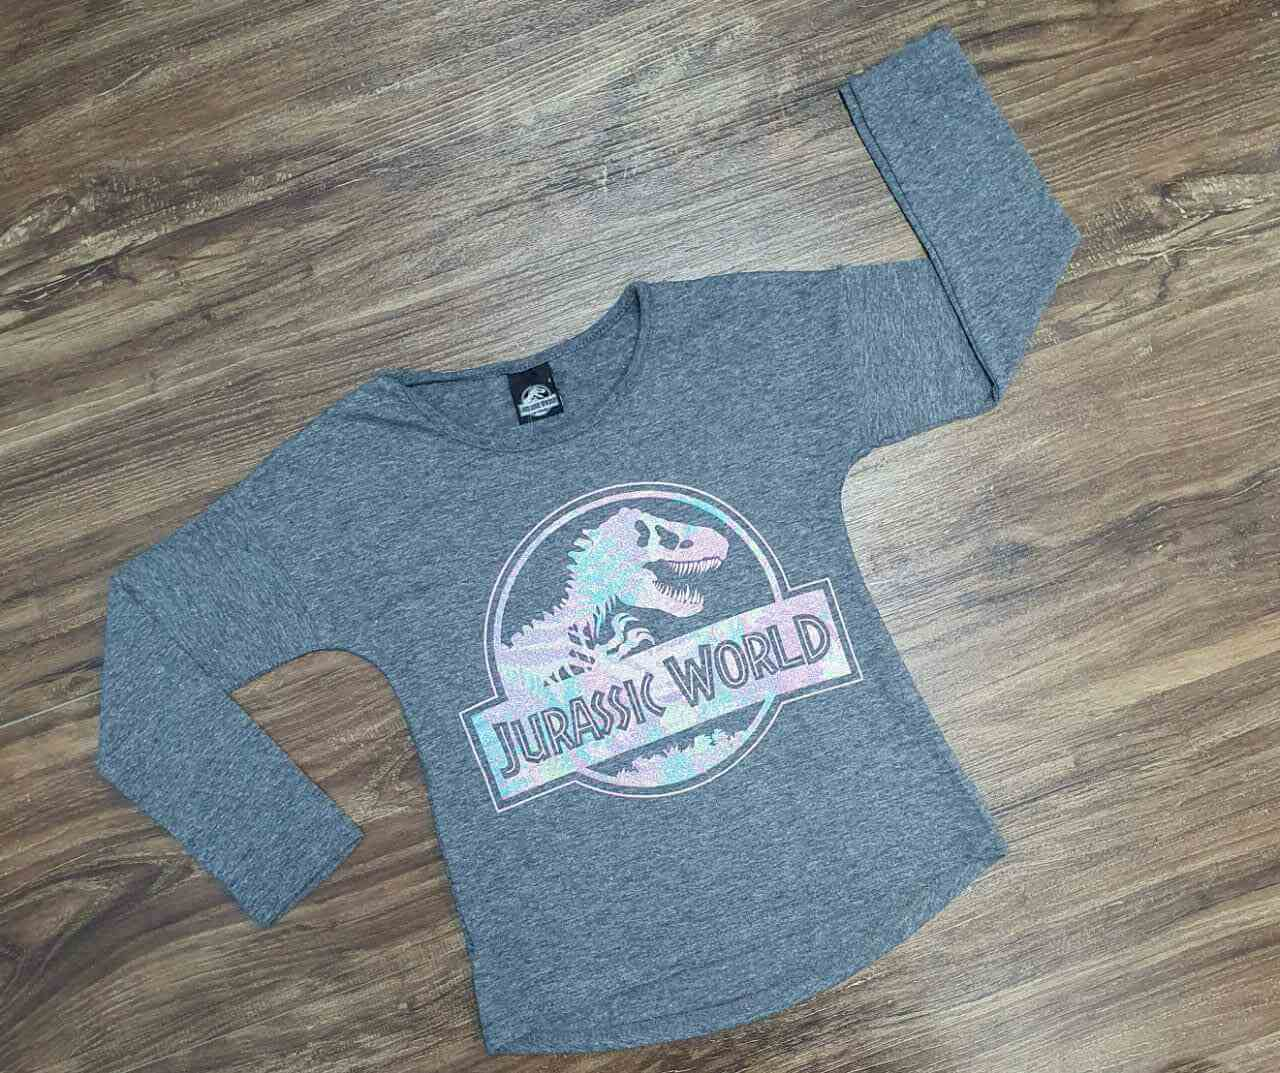 Blusa Jurassic World Infantil